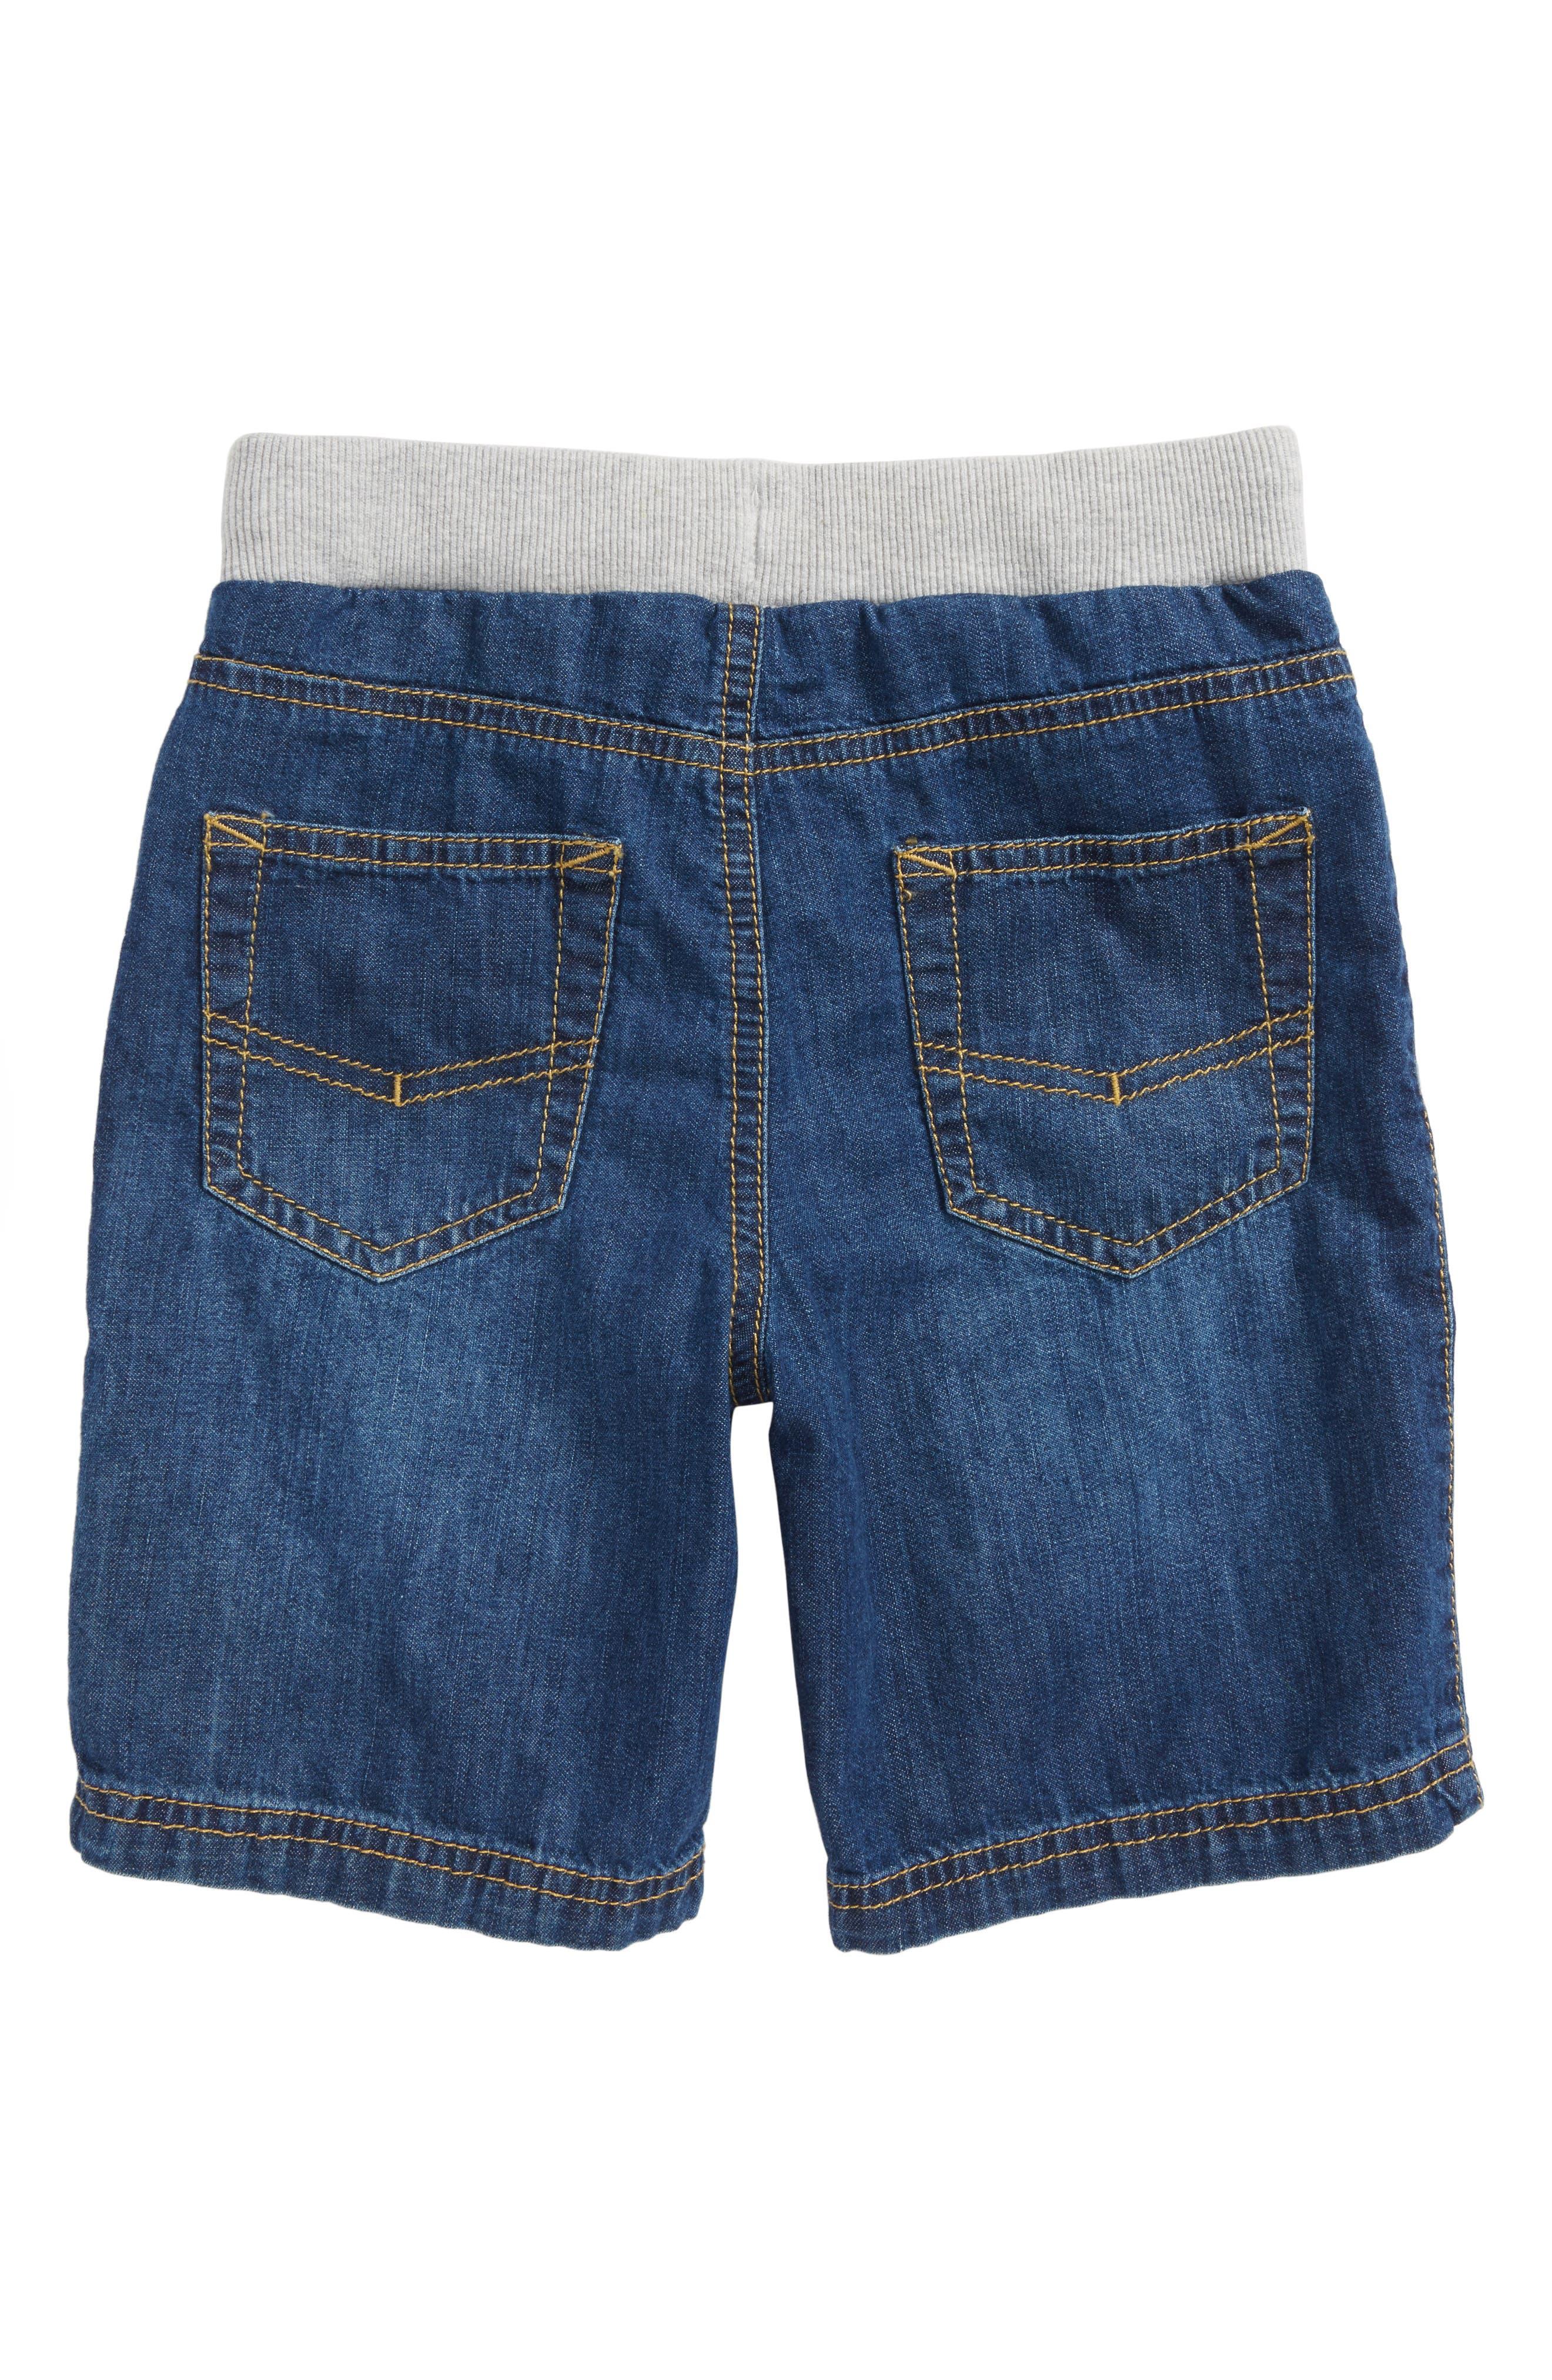 Denim Shorts,                             Alternate thumbnail 2, color,